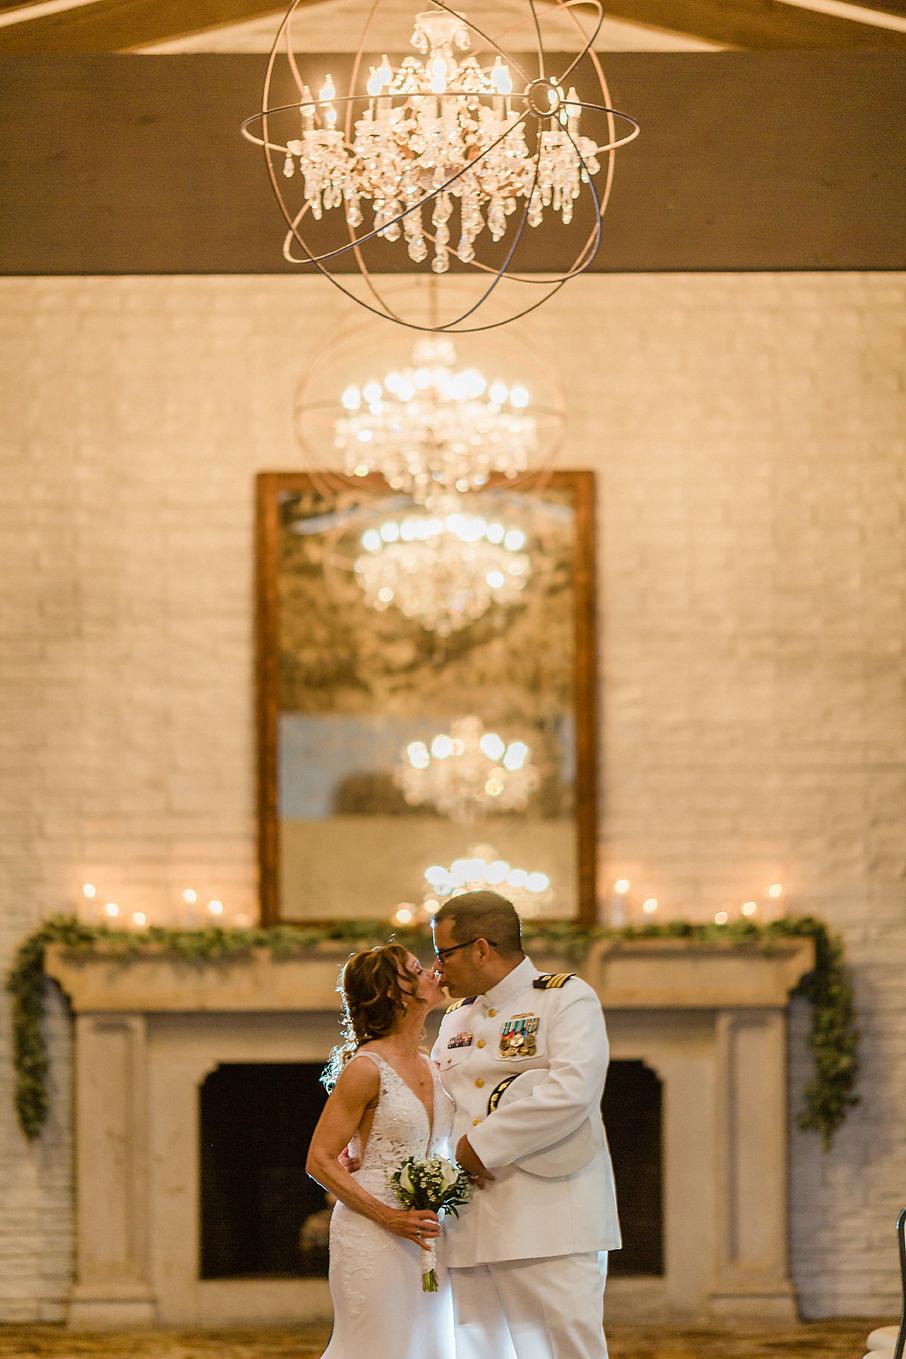 Dallas Wedding photographer Las Colinas Country Club bride groom romantic portrait Kate Marie Portraiture 2.png